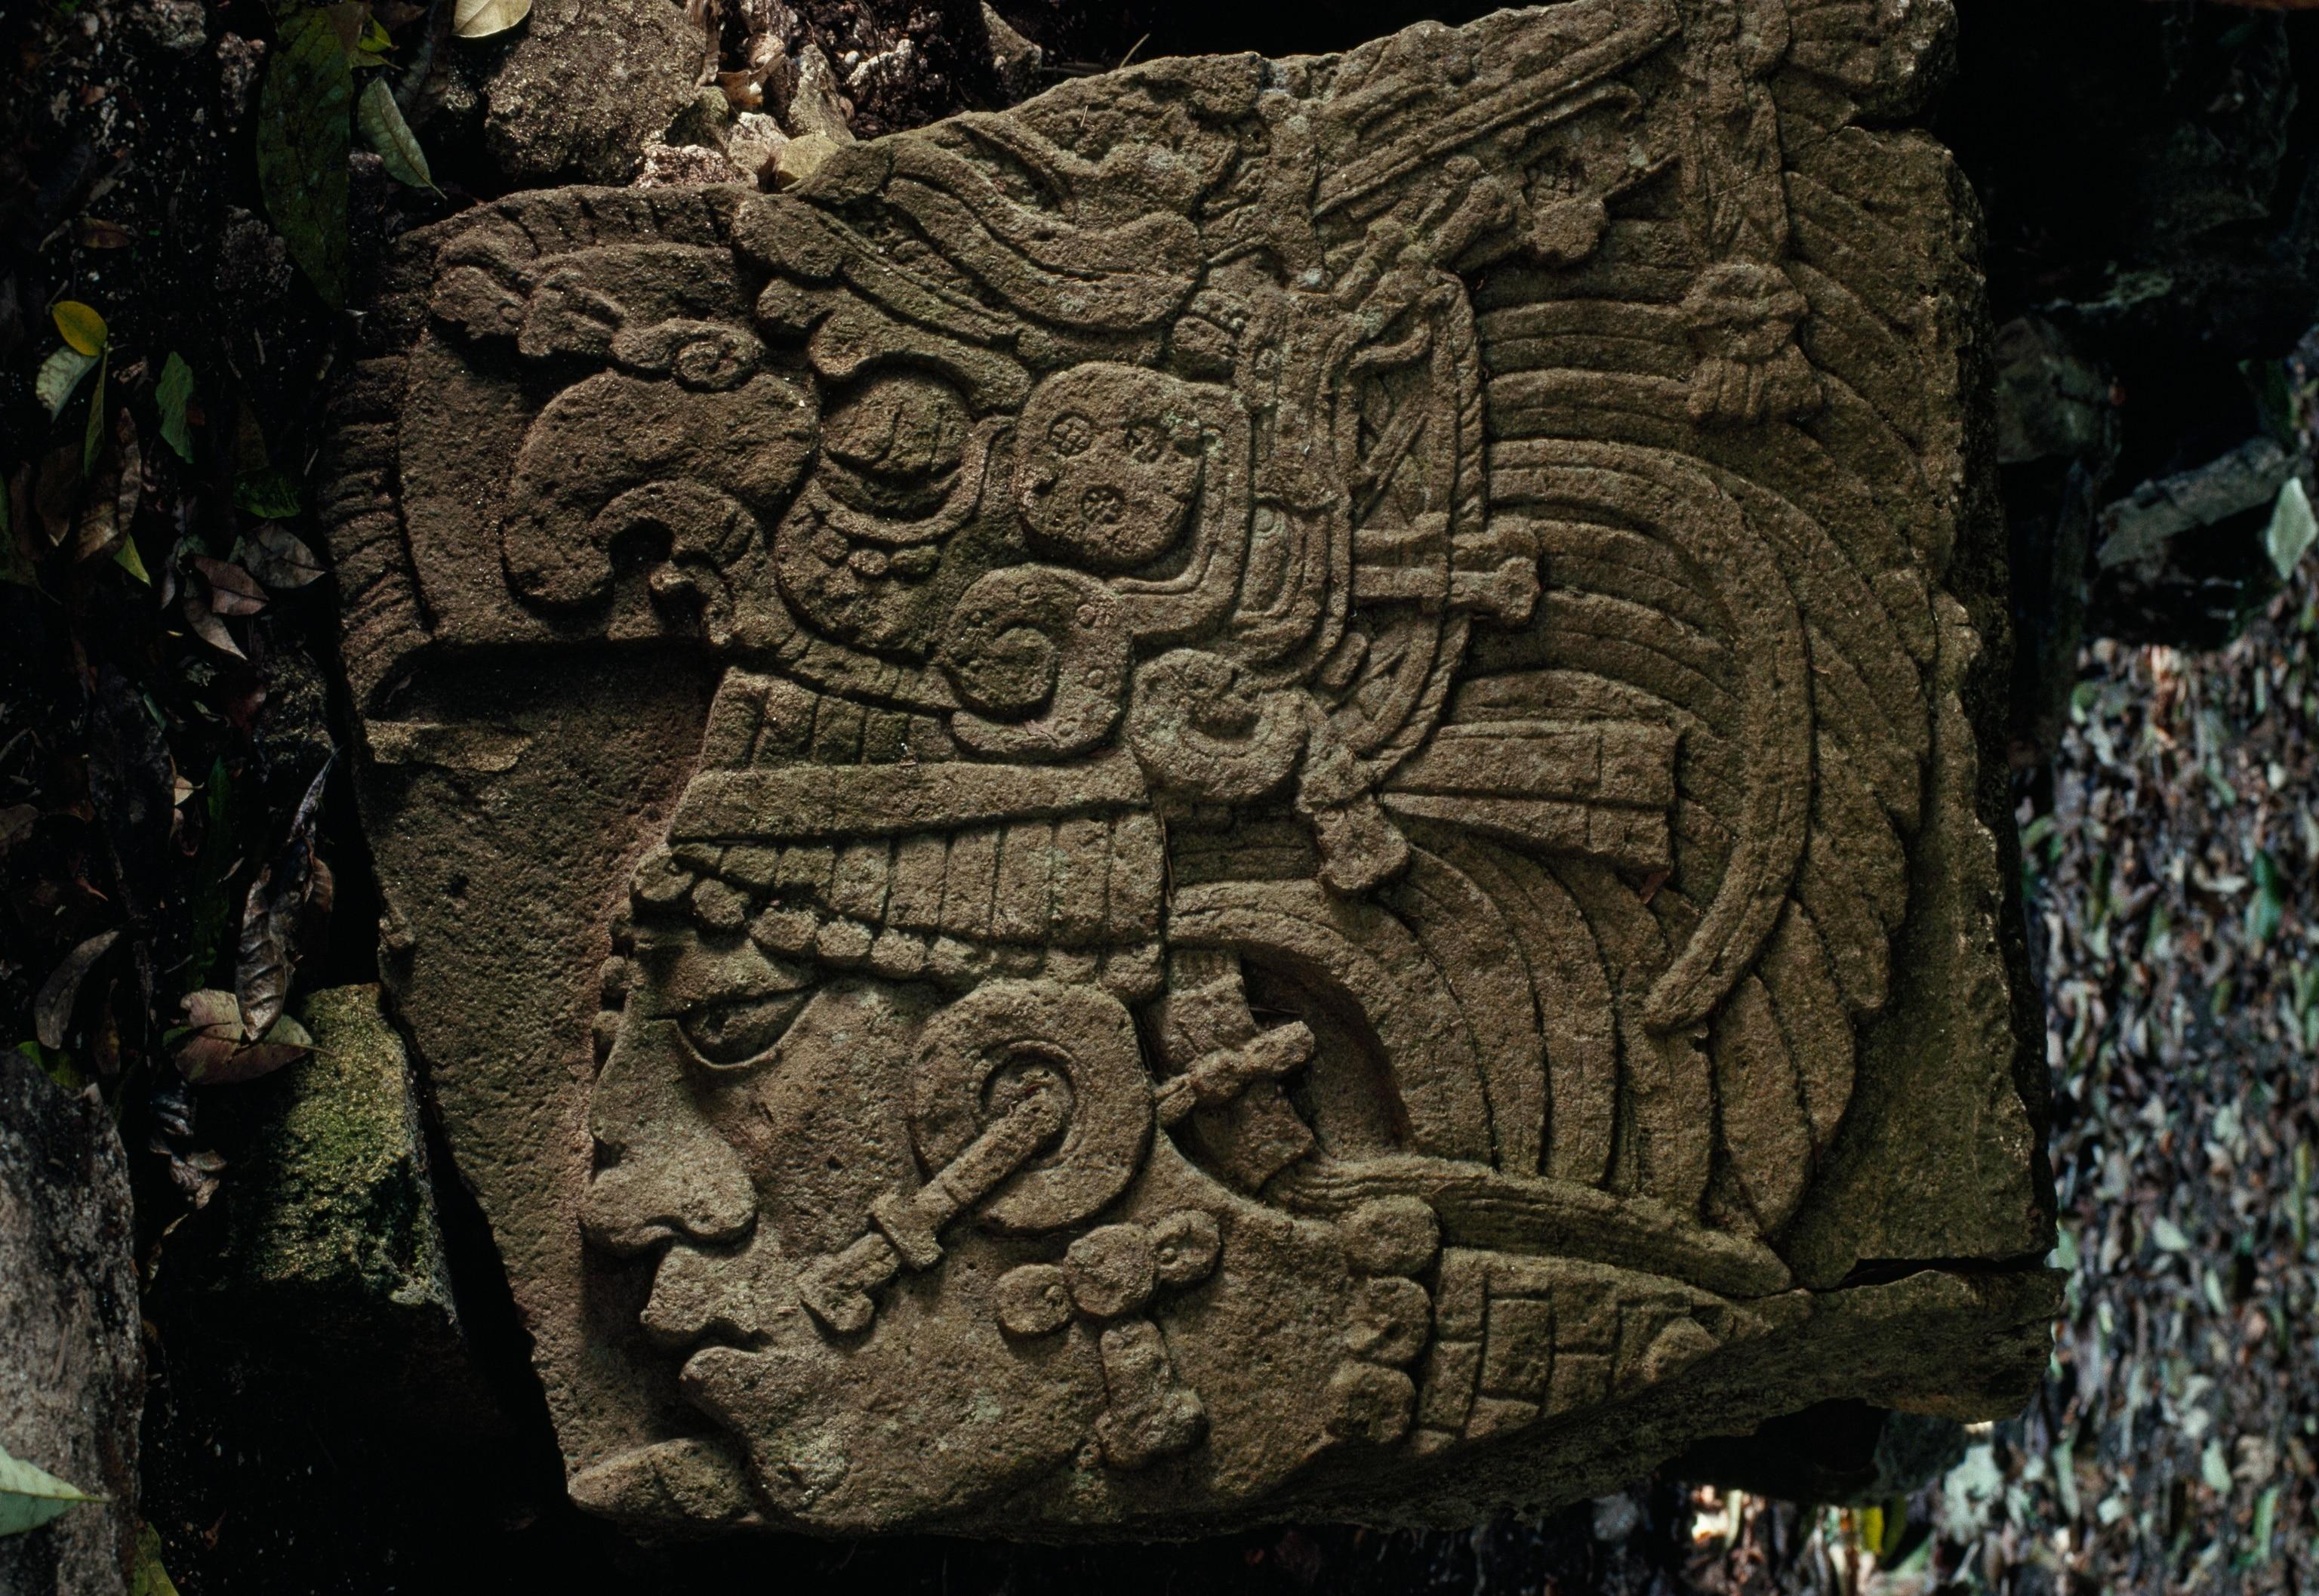 Mayan Warrior | Nat Geo Photo of the Day